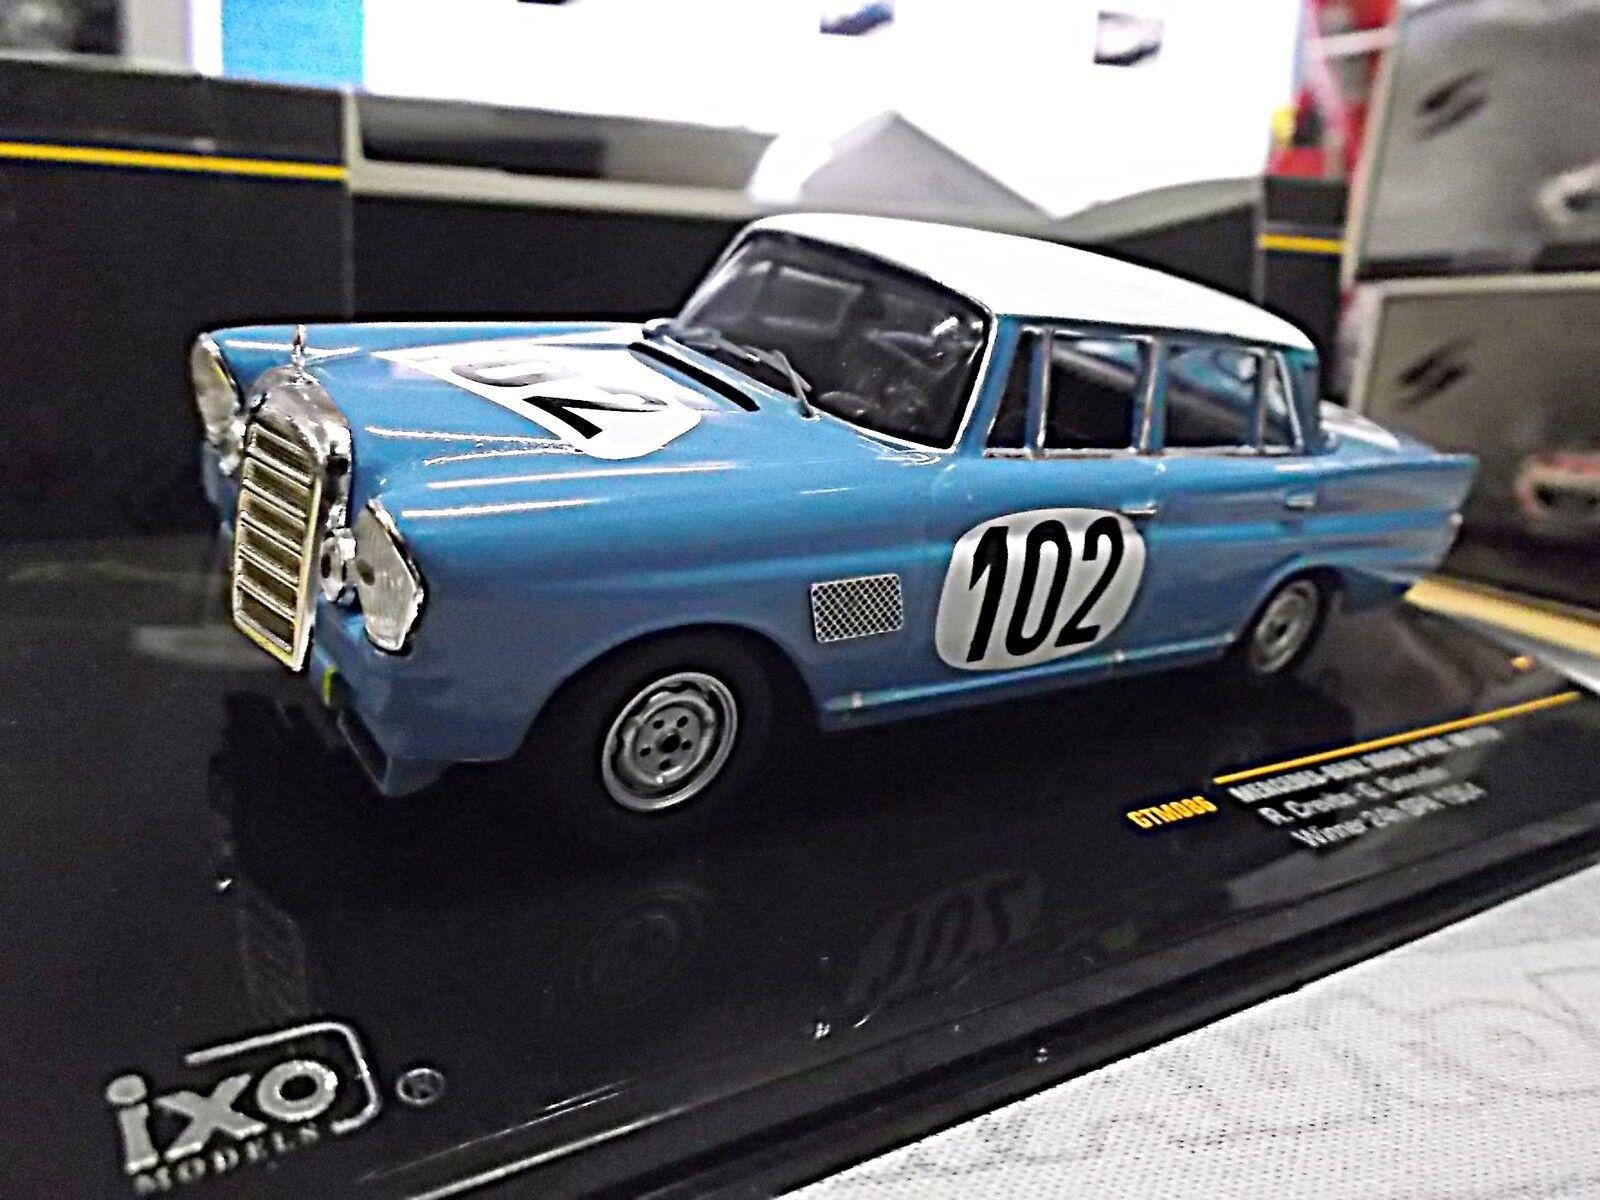 MERCEDES Benz 300se w111 aileron arrière racing 24h spa 1964 winner  102 IXO 1 43